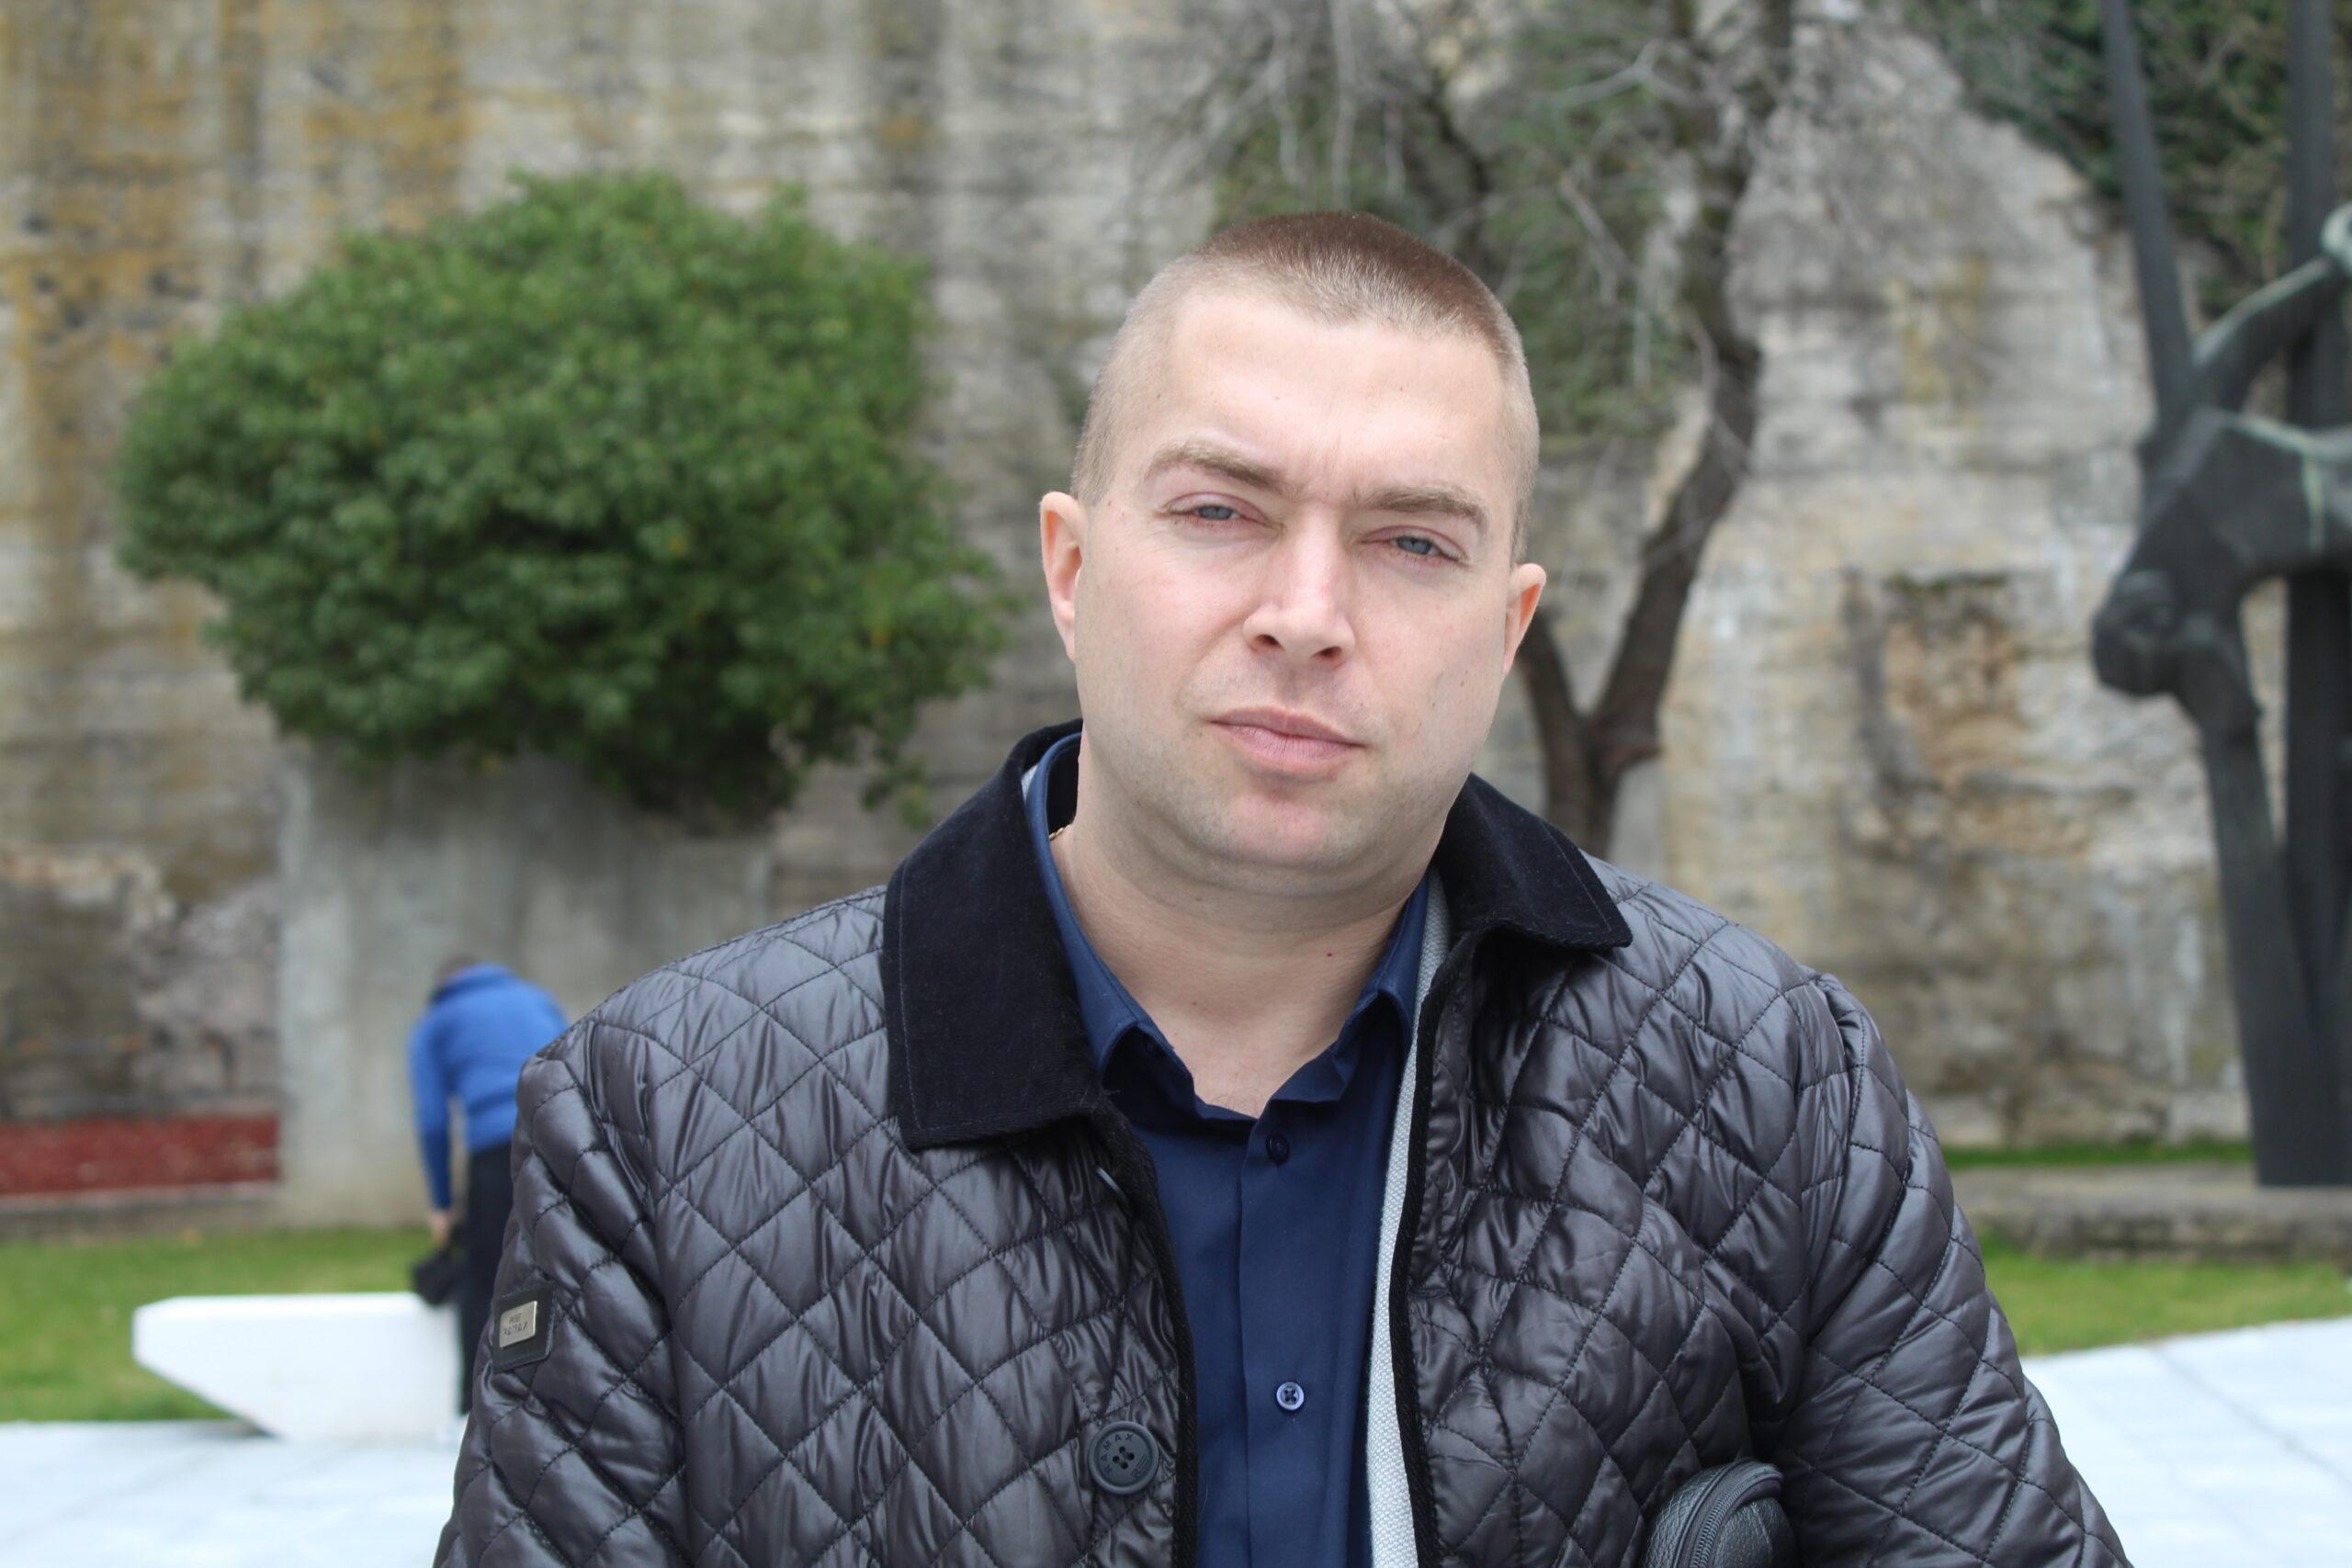 Foto: Vladan Karapadžić